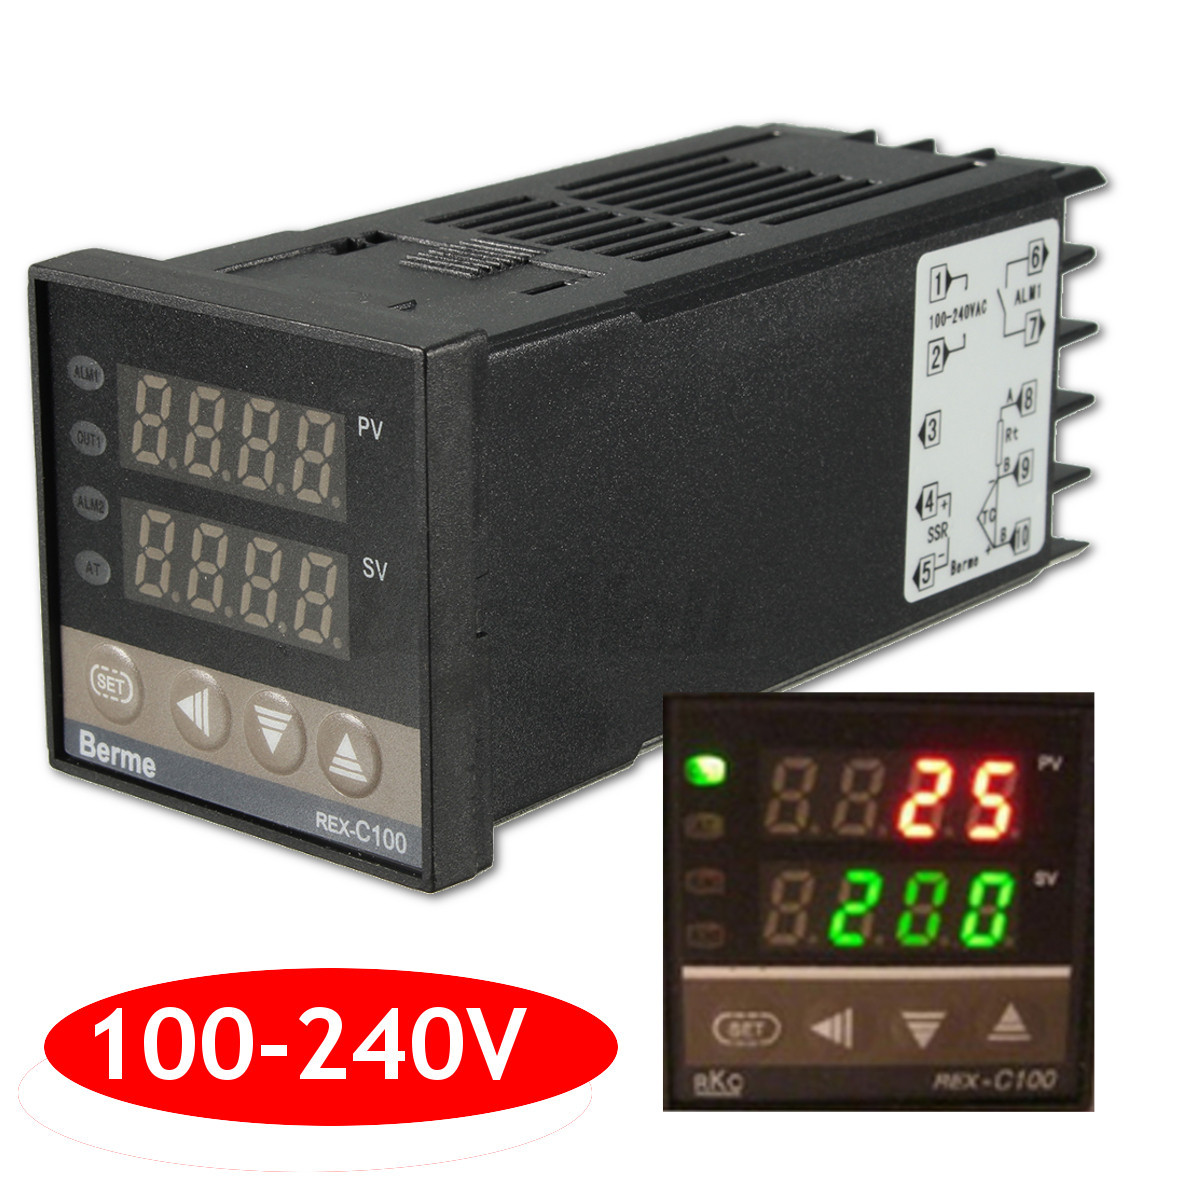 PID REX C100 Temperature Controller   40A SSR   K Thermocouple eBay #C70404